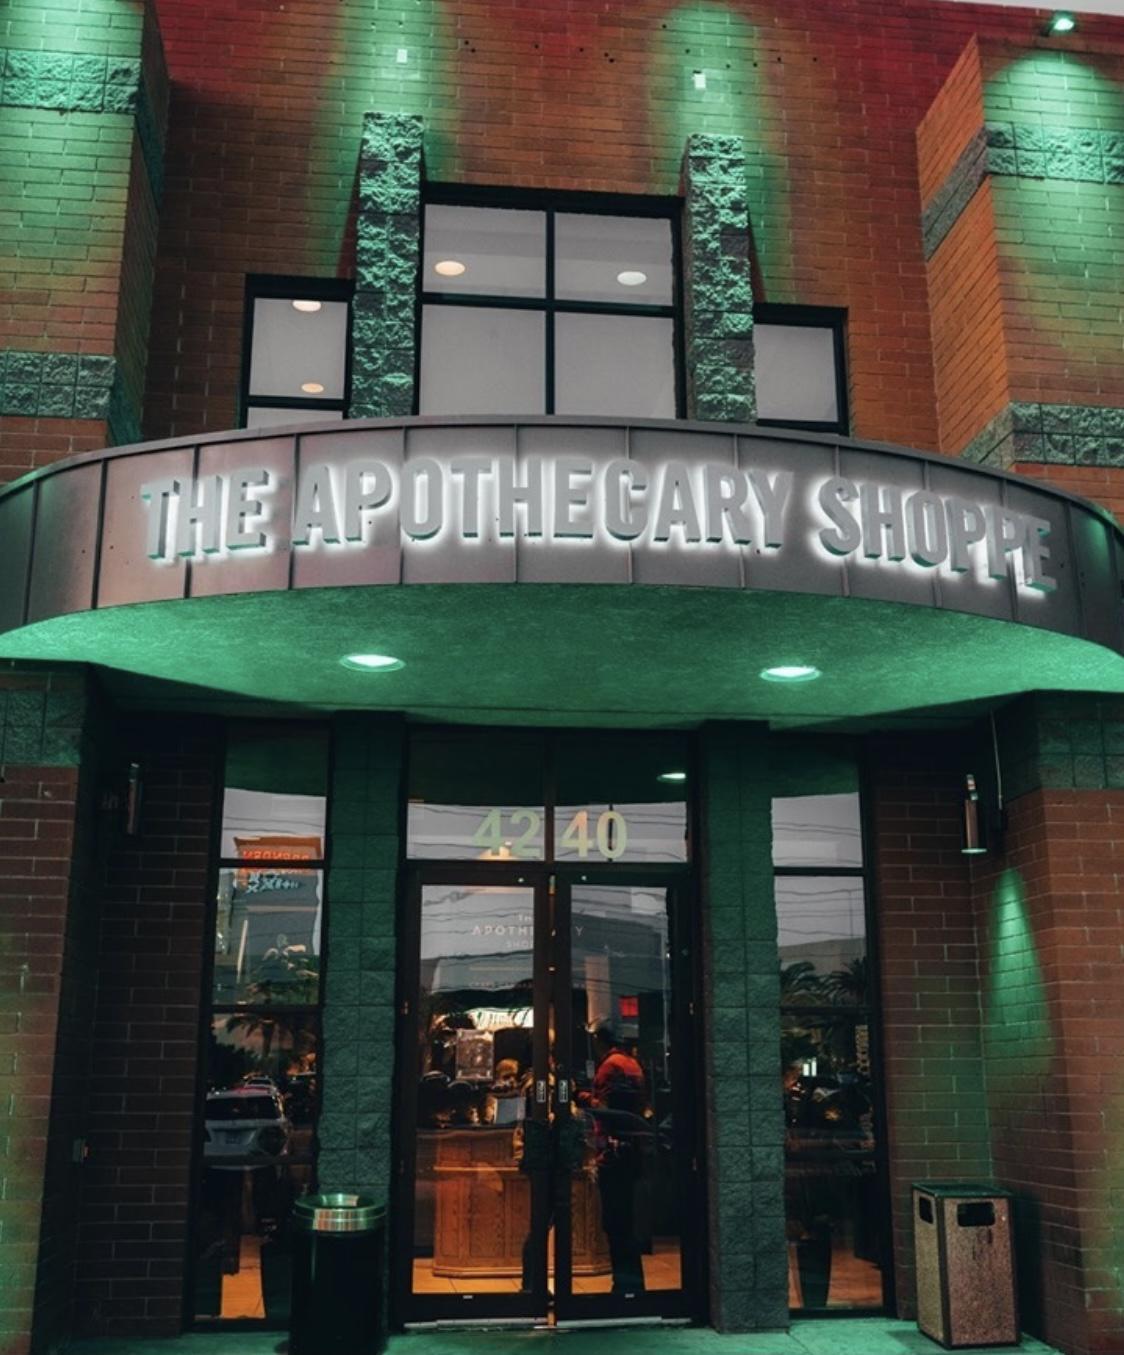 You spoke, The Apothecary Shoppe listened!